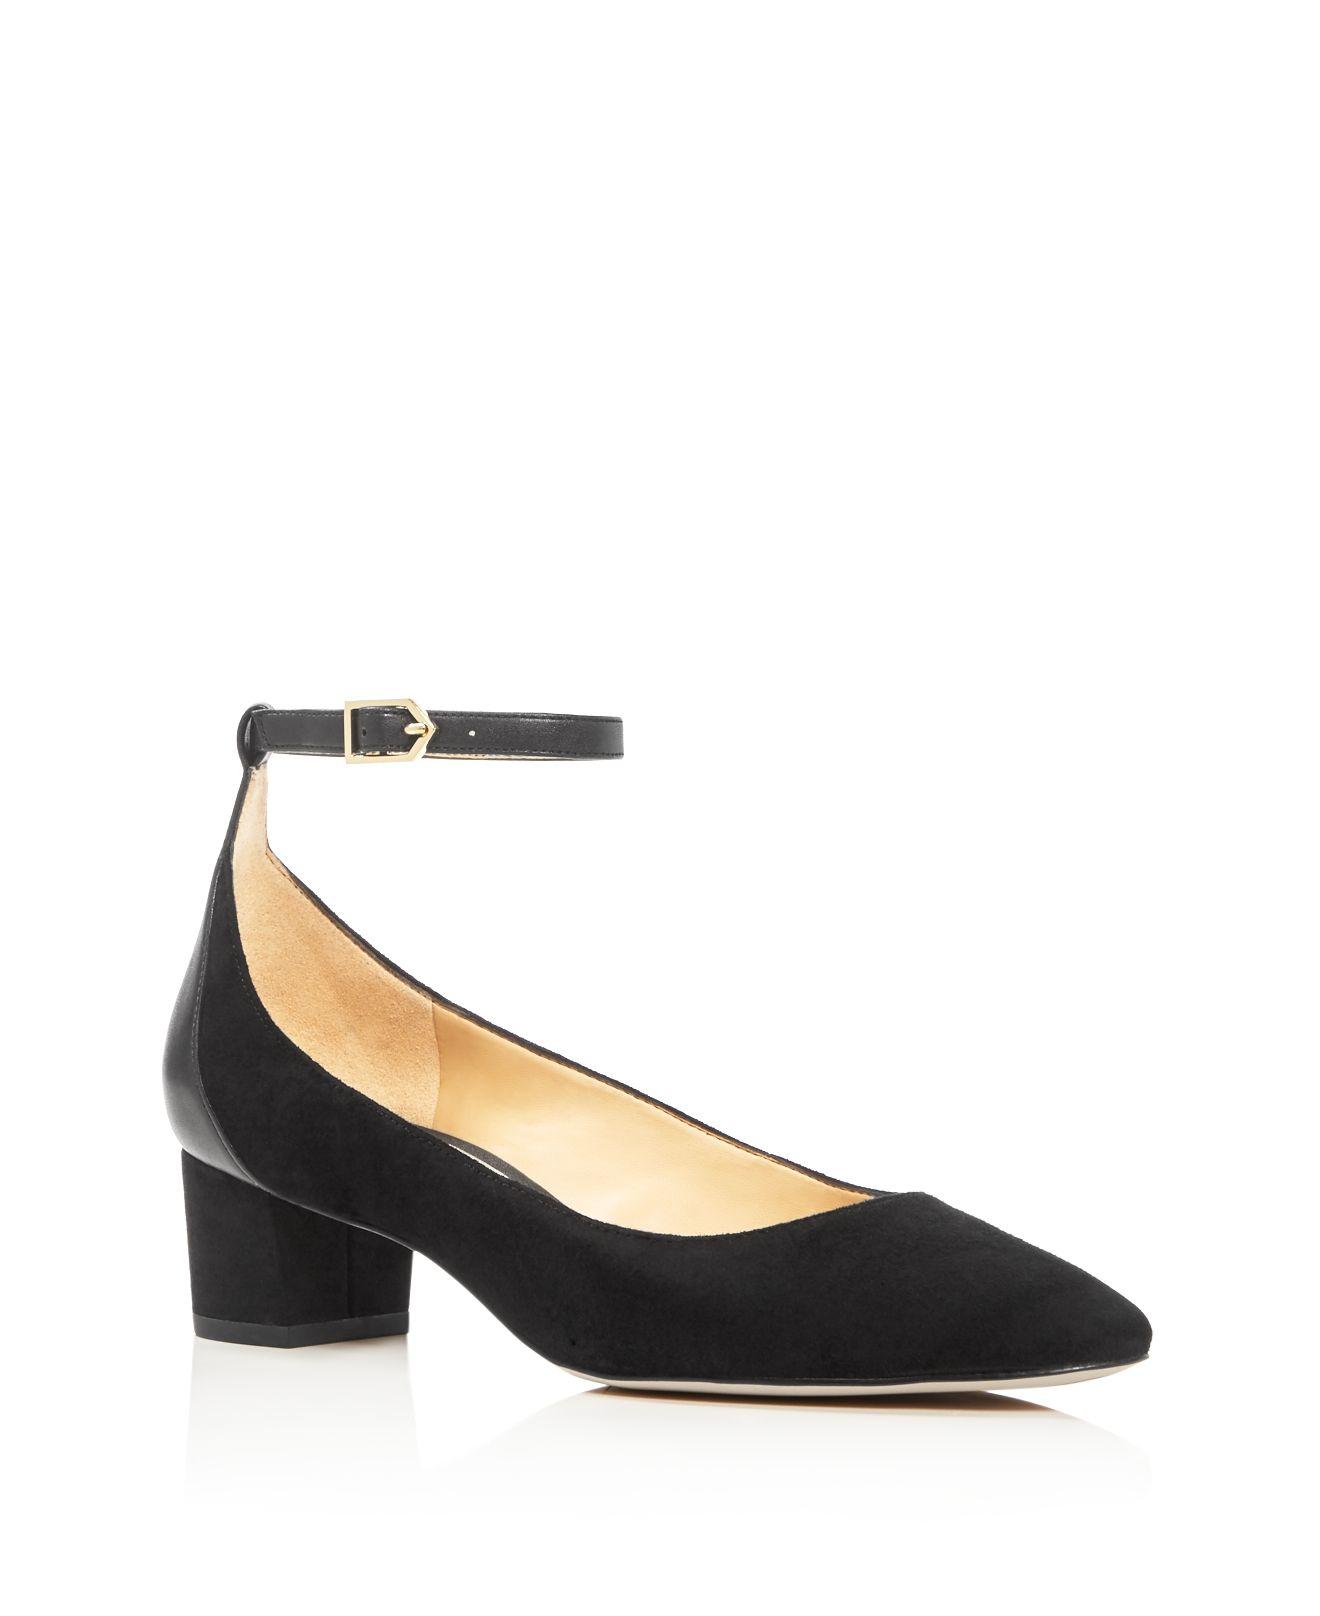 Sam Edelman Lola Ankle Strap Low Heel Pumps In Black Lyst